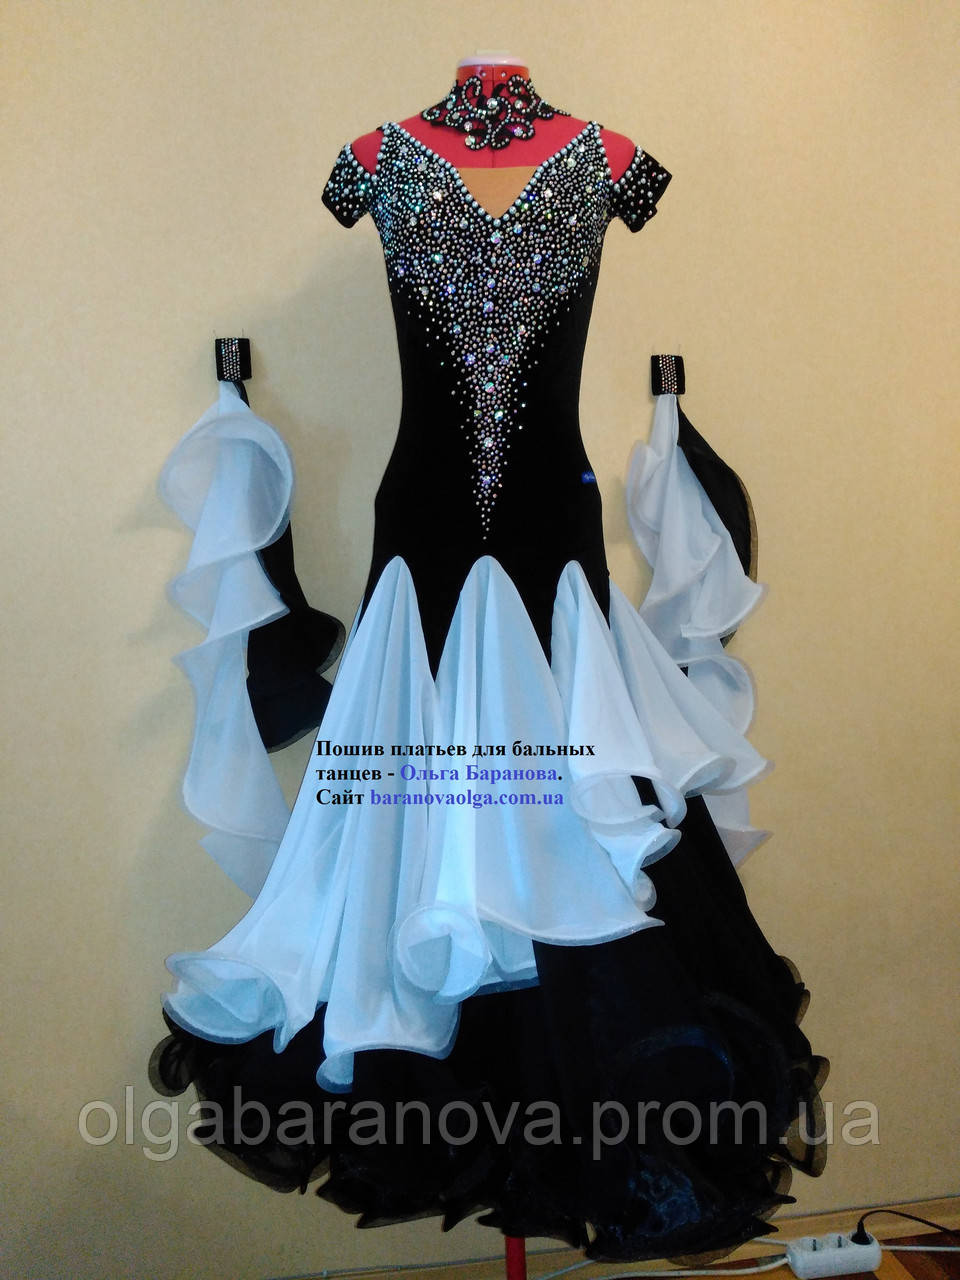 Мастер-класс по пошиву платьев стандарт